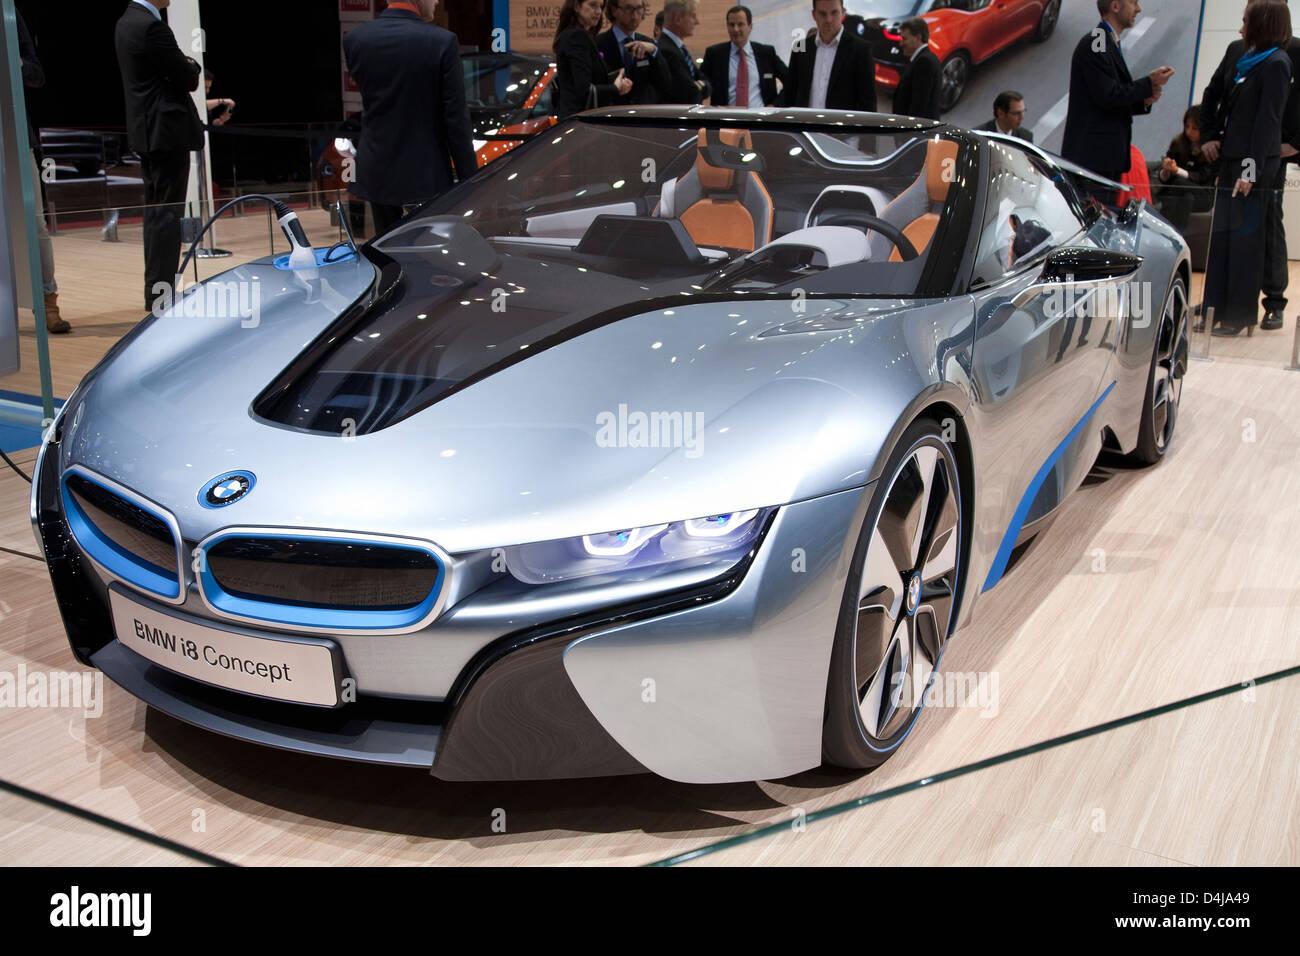 Bmw I8 Concept Spyder Geneva Motor Show 2013 Stock Photo 54492825